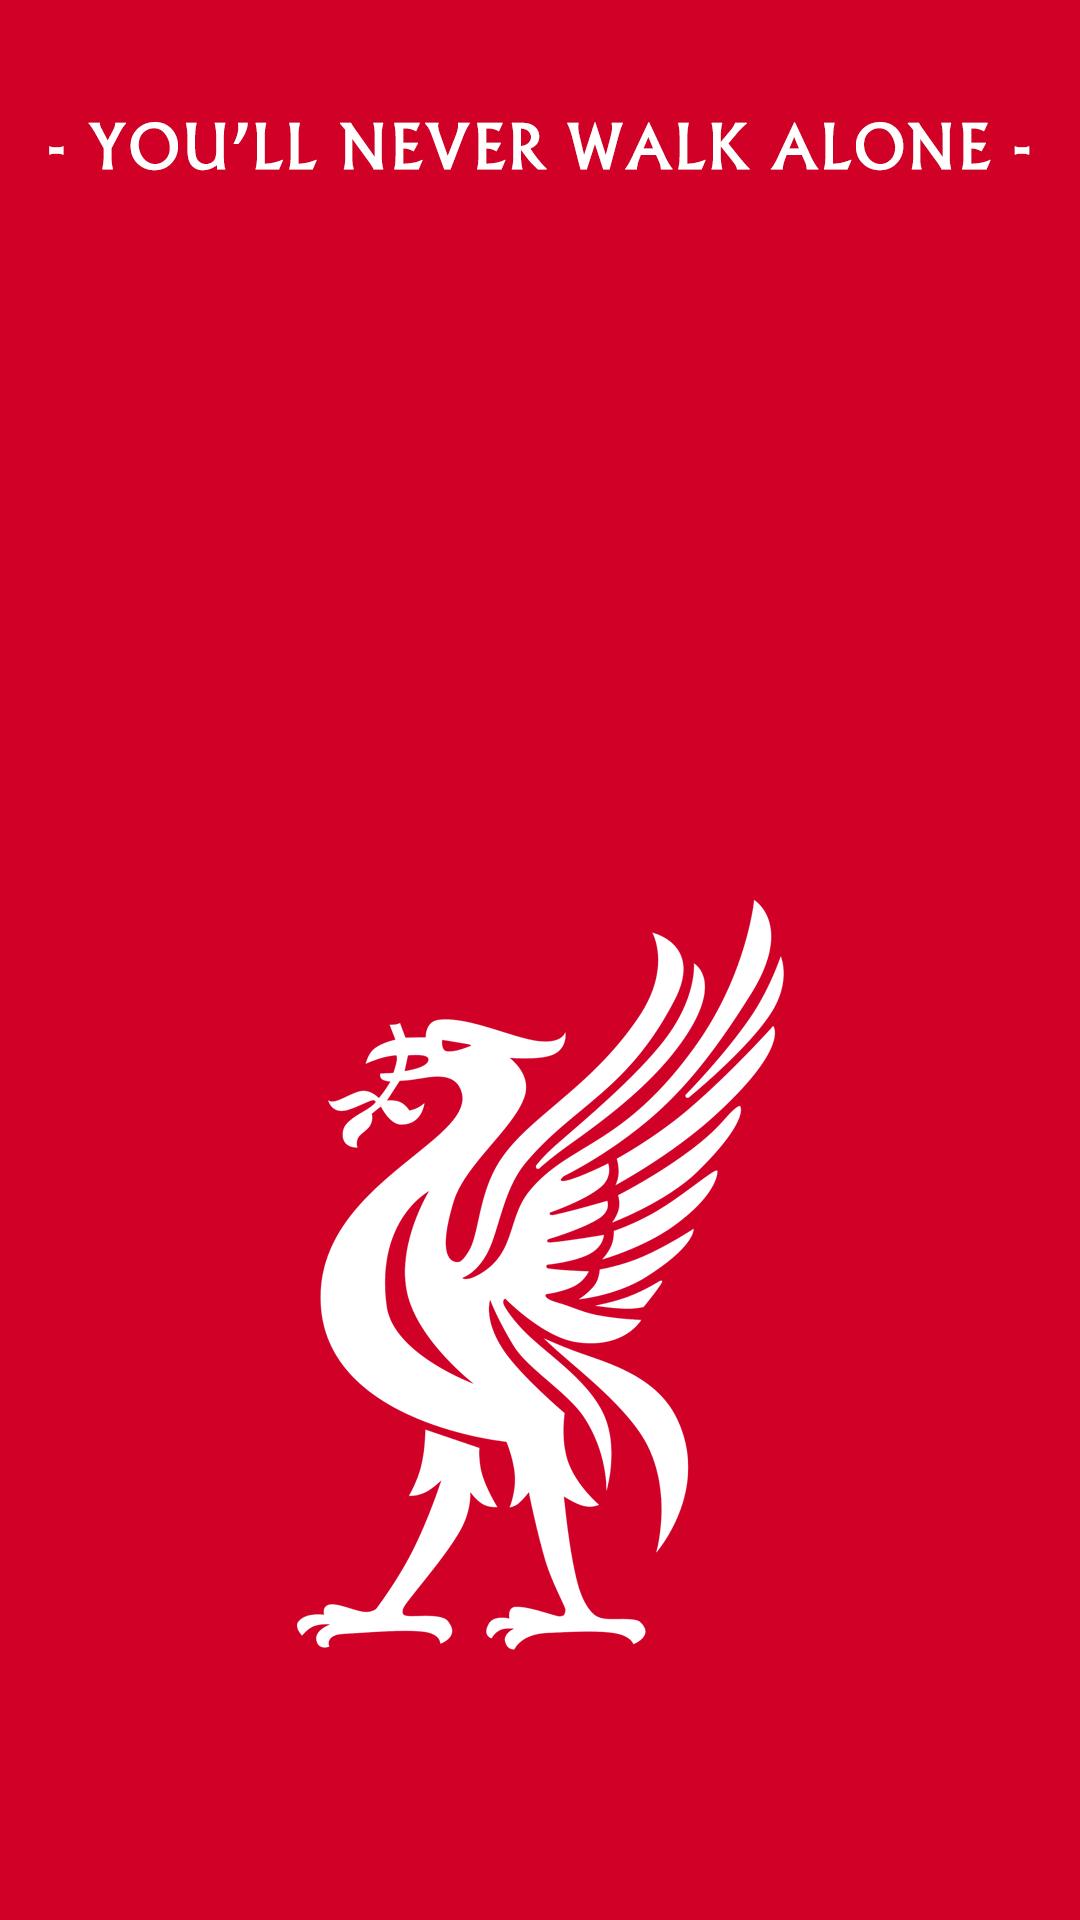 Liverpool FC Wallpapers – Album on Imgur